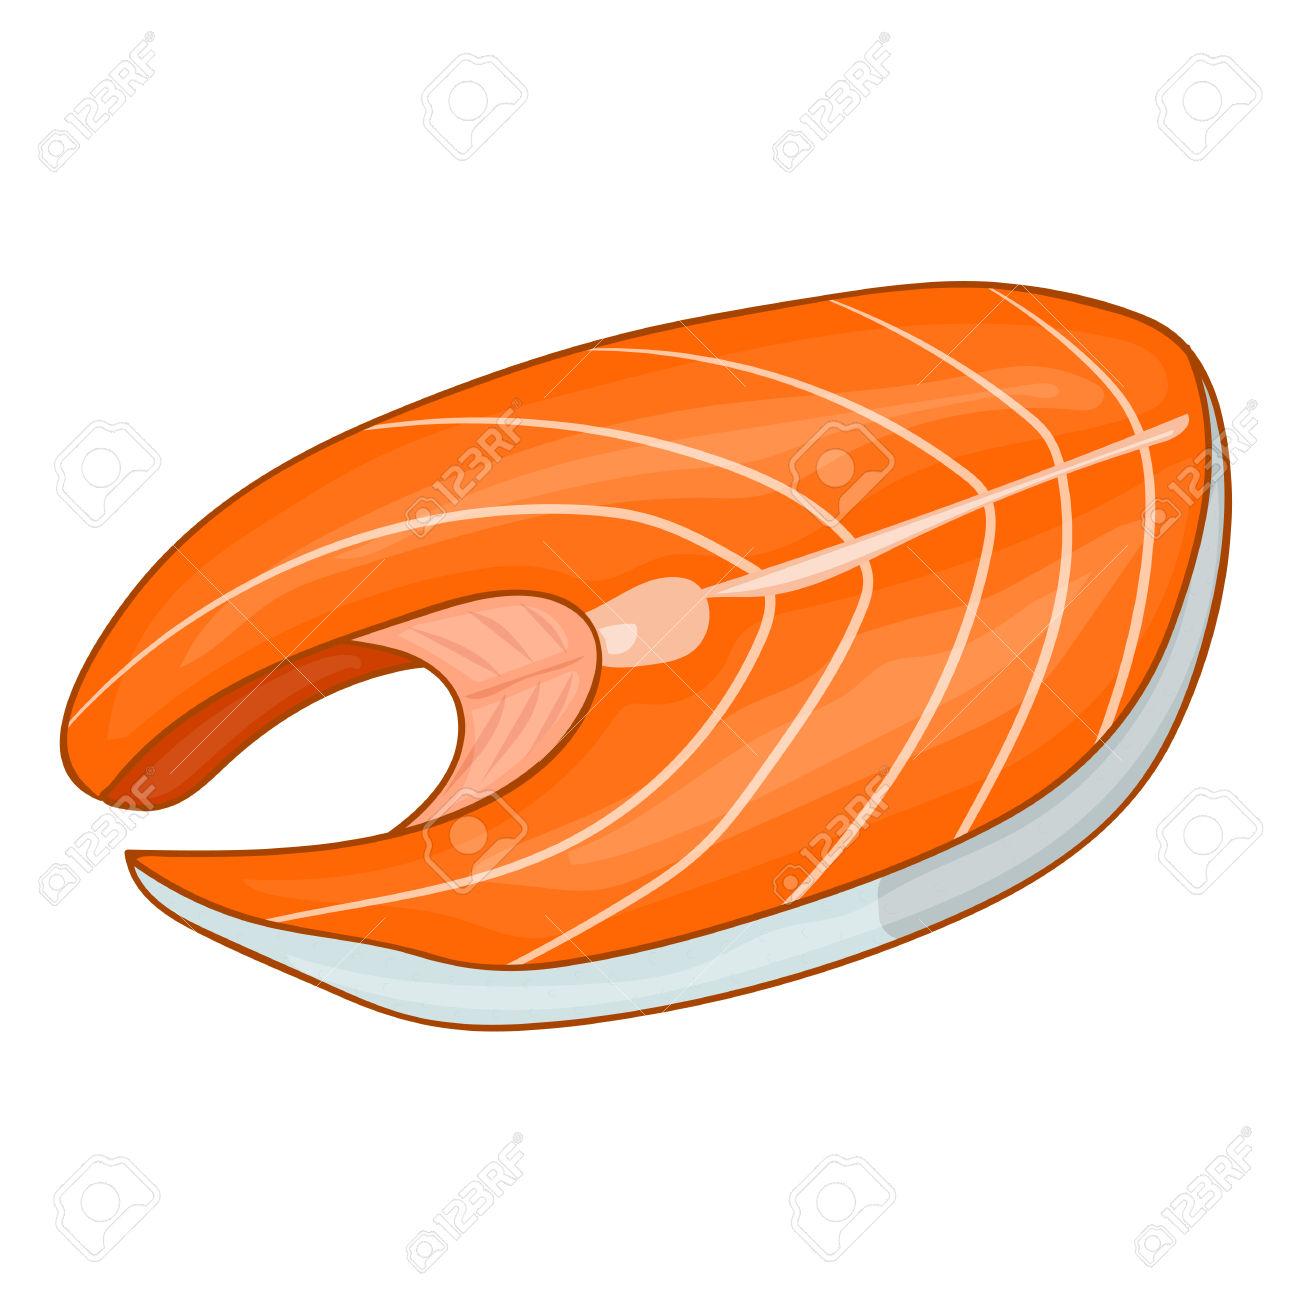 Fish Steak Of Tuna Isolated Illustration On White Background.